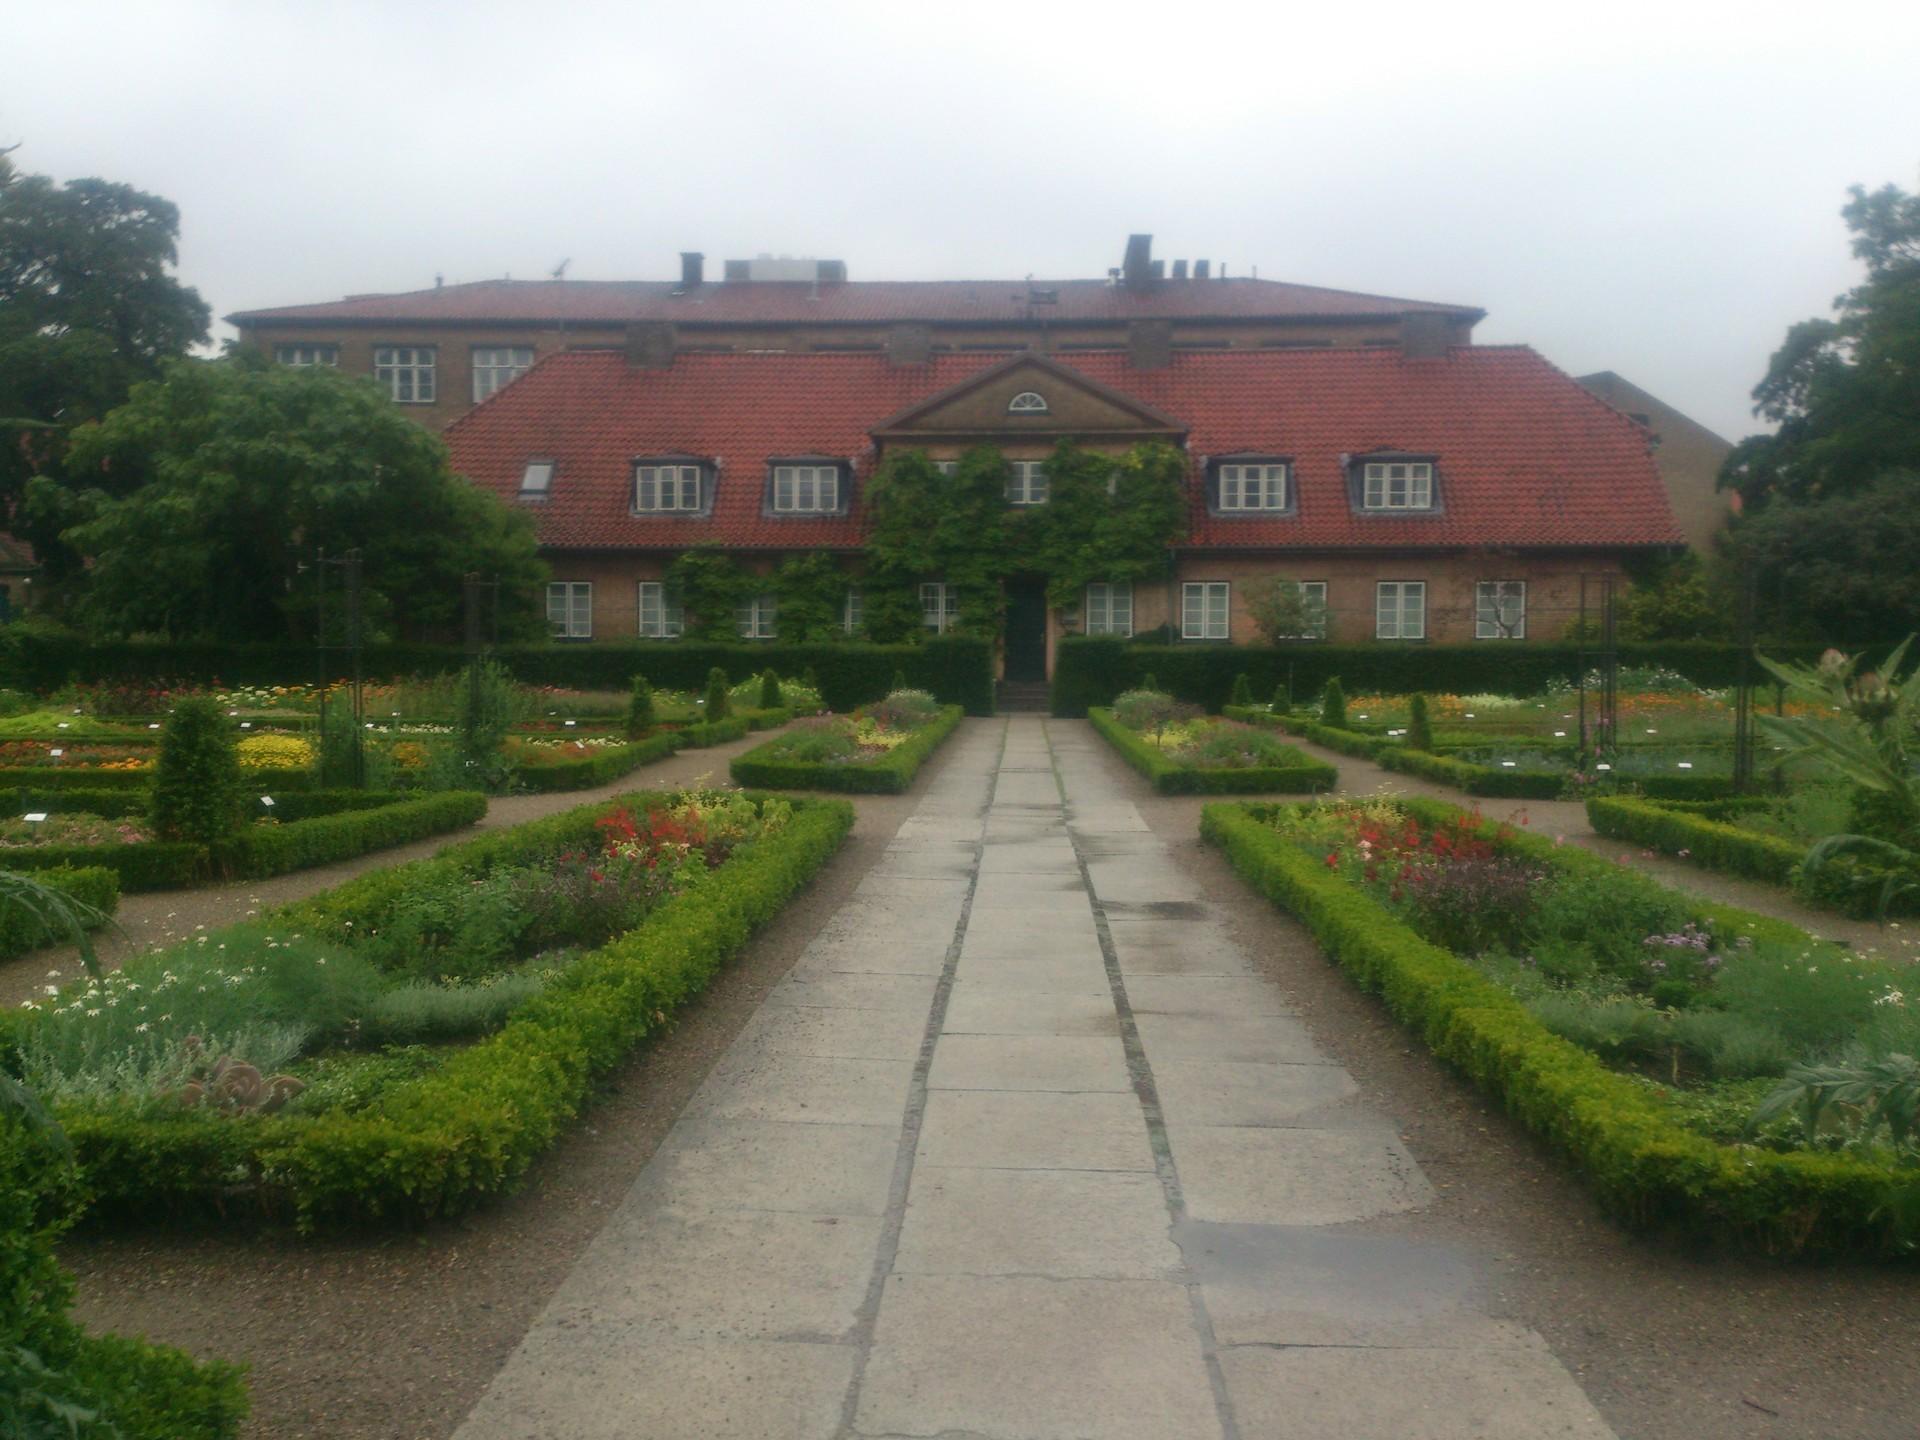 Housing Foundation, Copenaghen